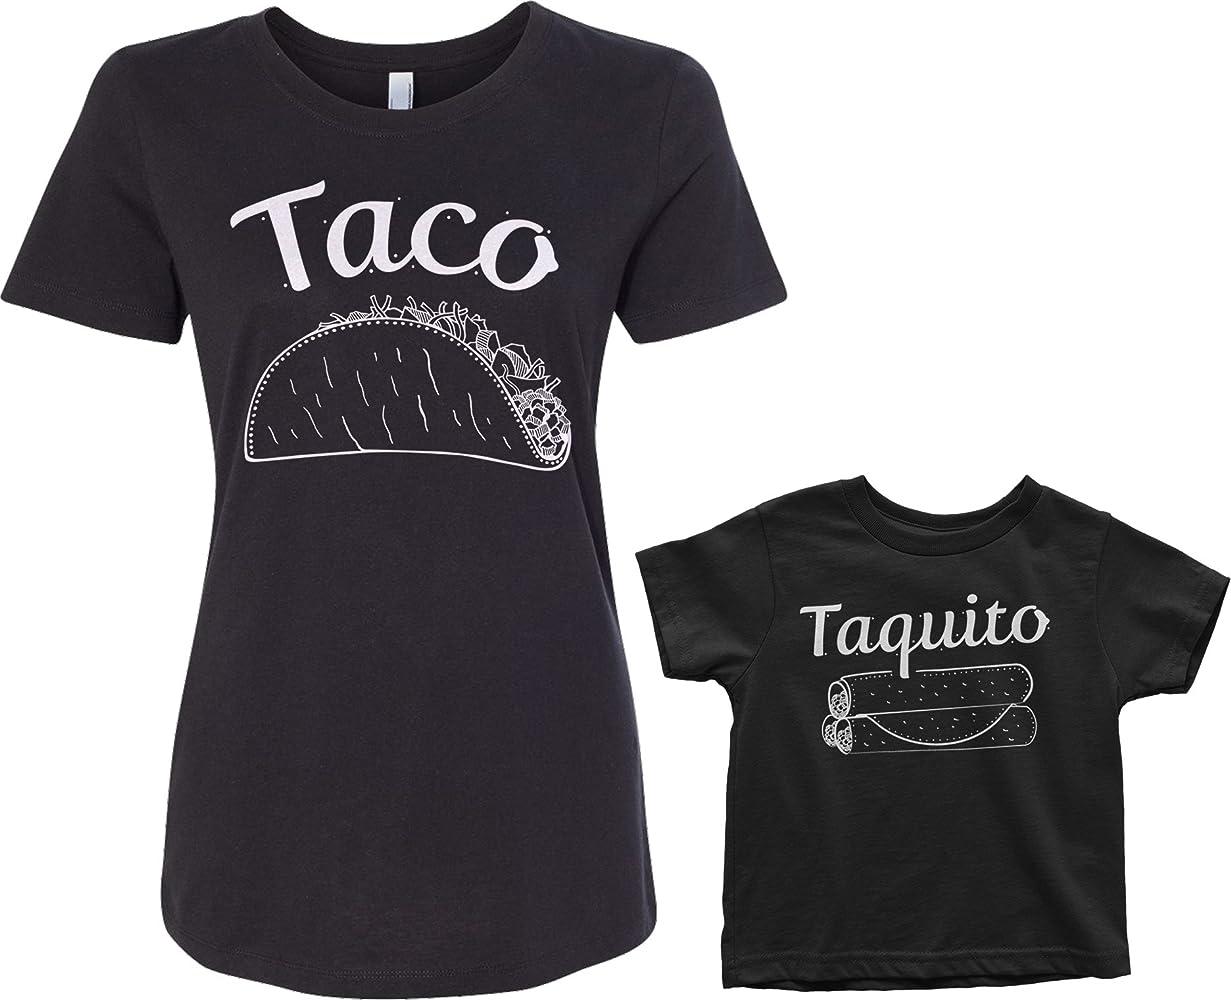 Amazon.com: threadrock taco & Taquito bebé & Mujer playera a ...